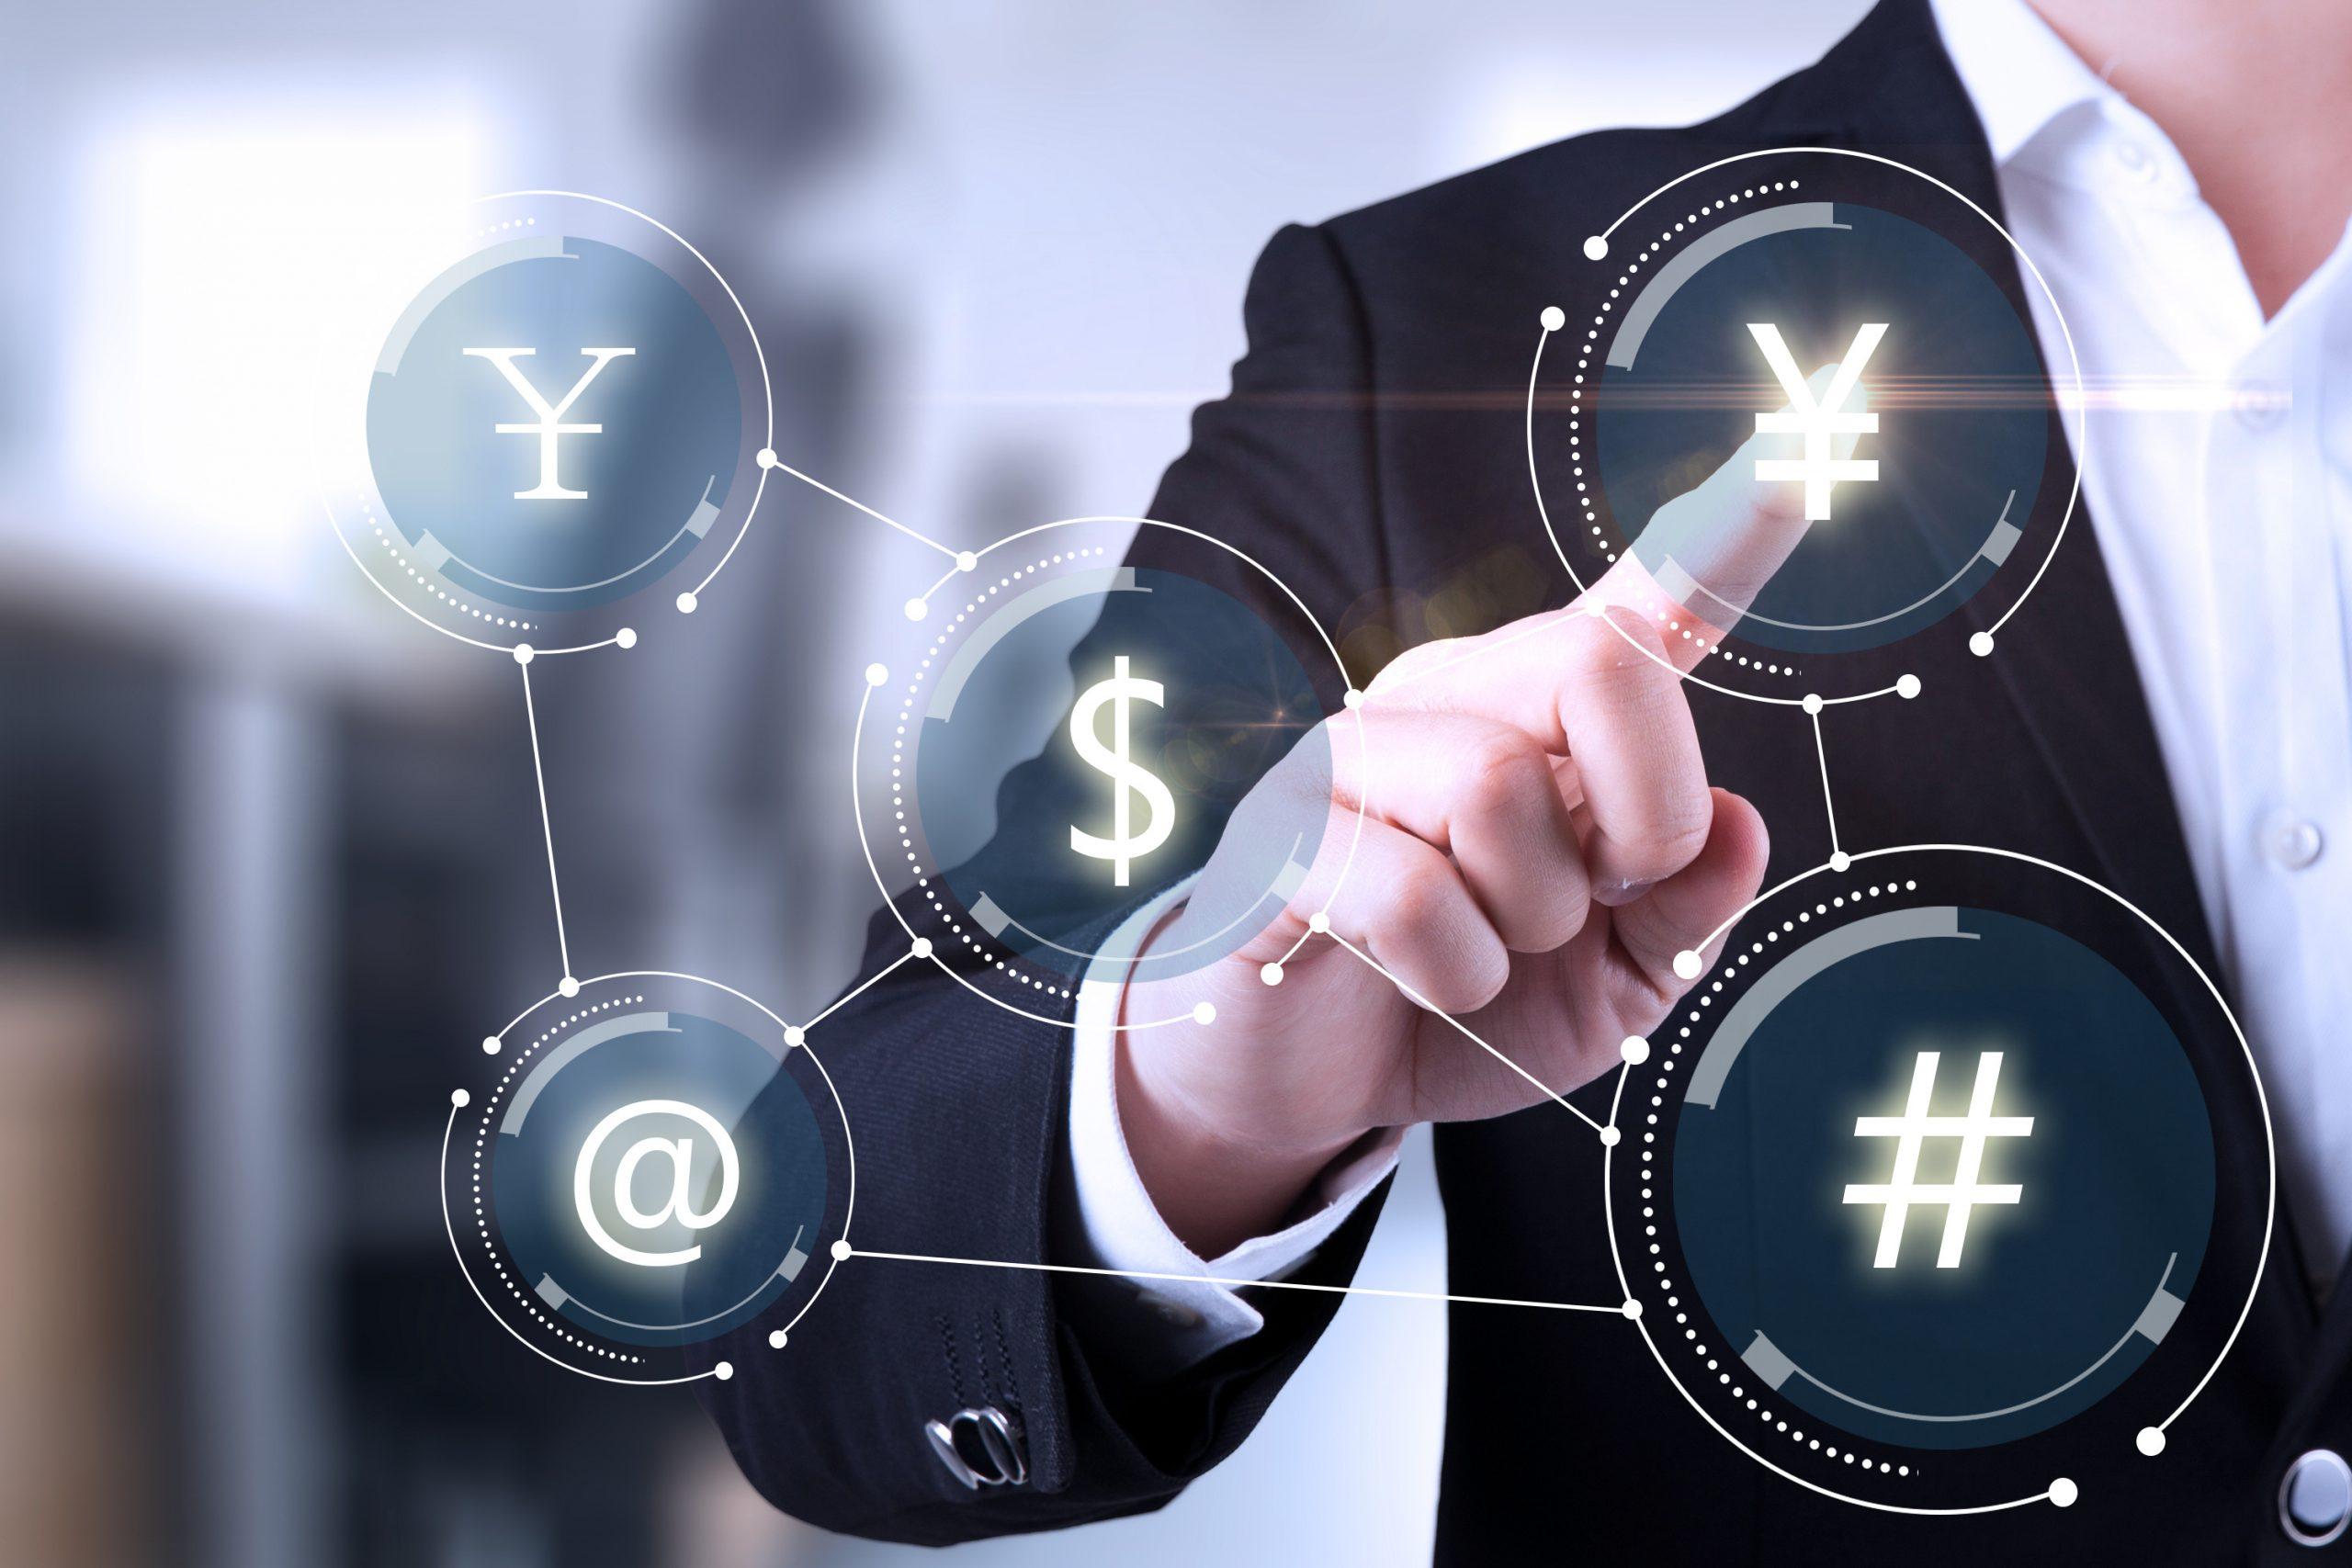 Lovepik_com-500746187-internet-business-finance